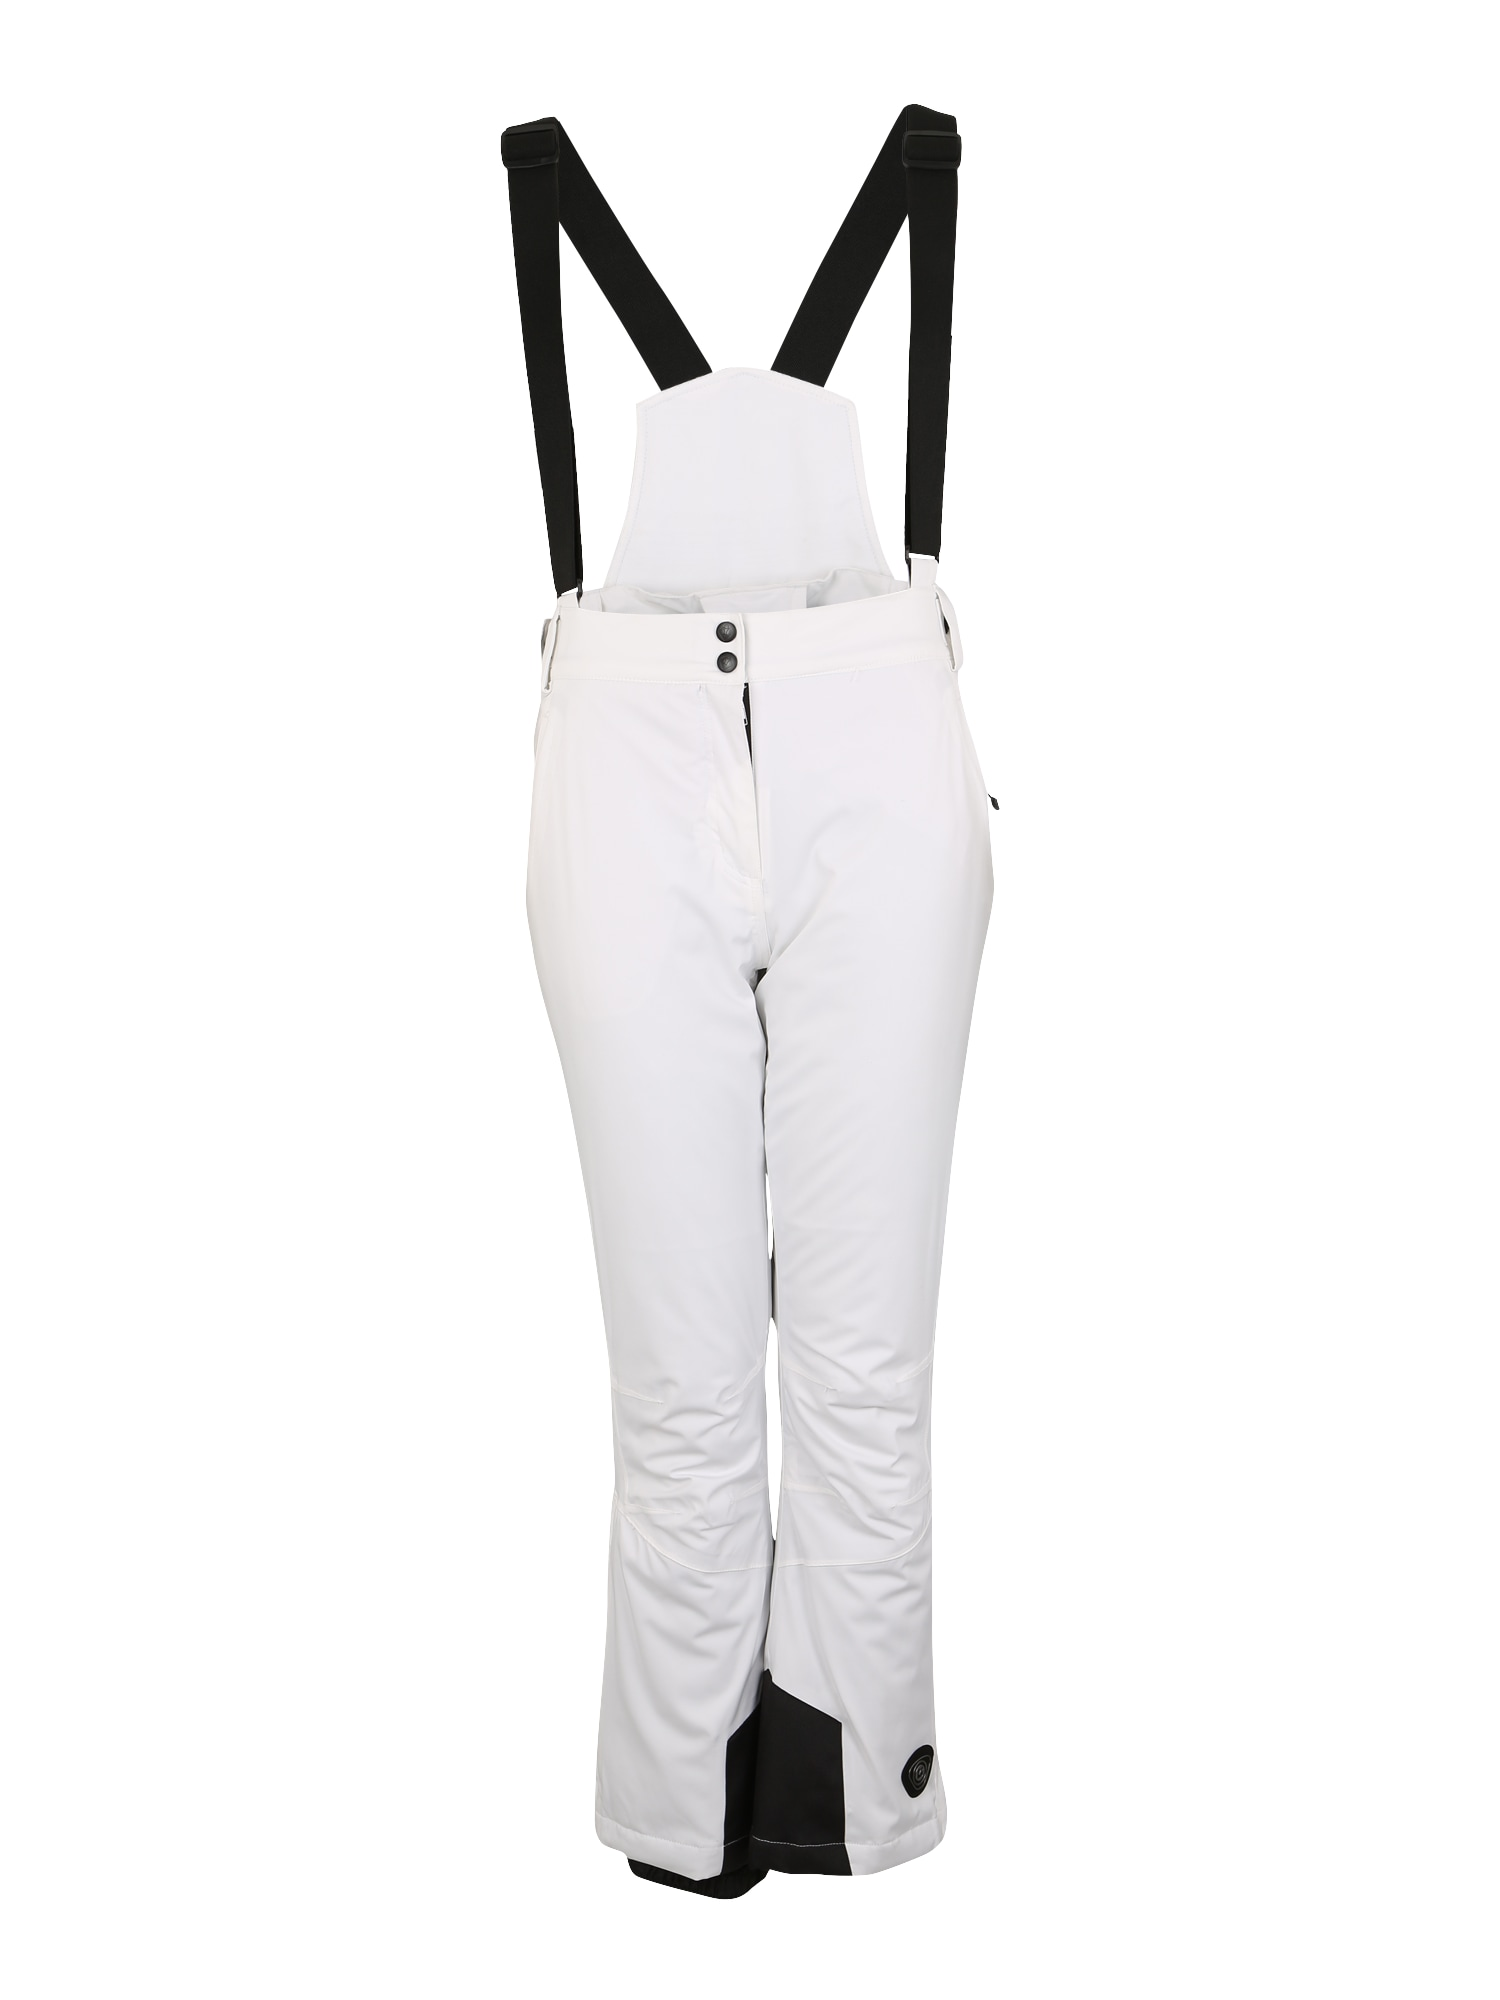 Outdoorové kalhoty Erielle bílá KILLTEC